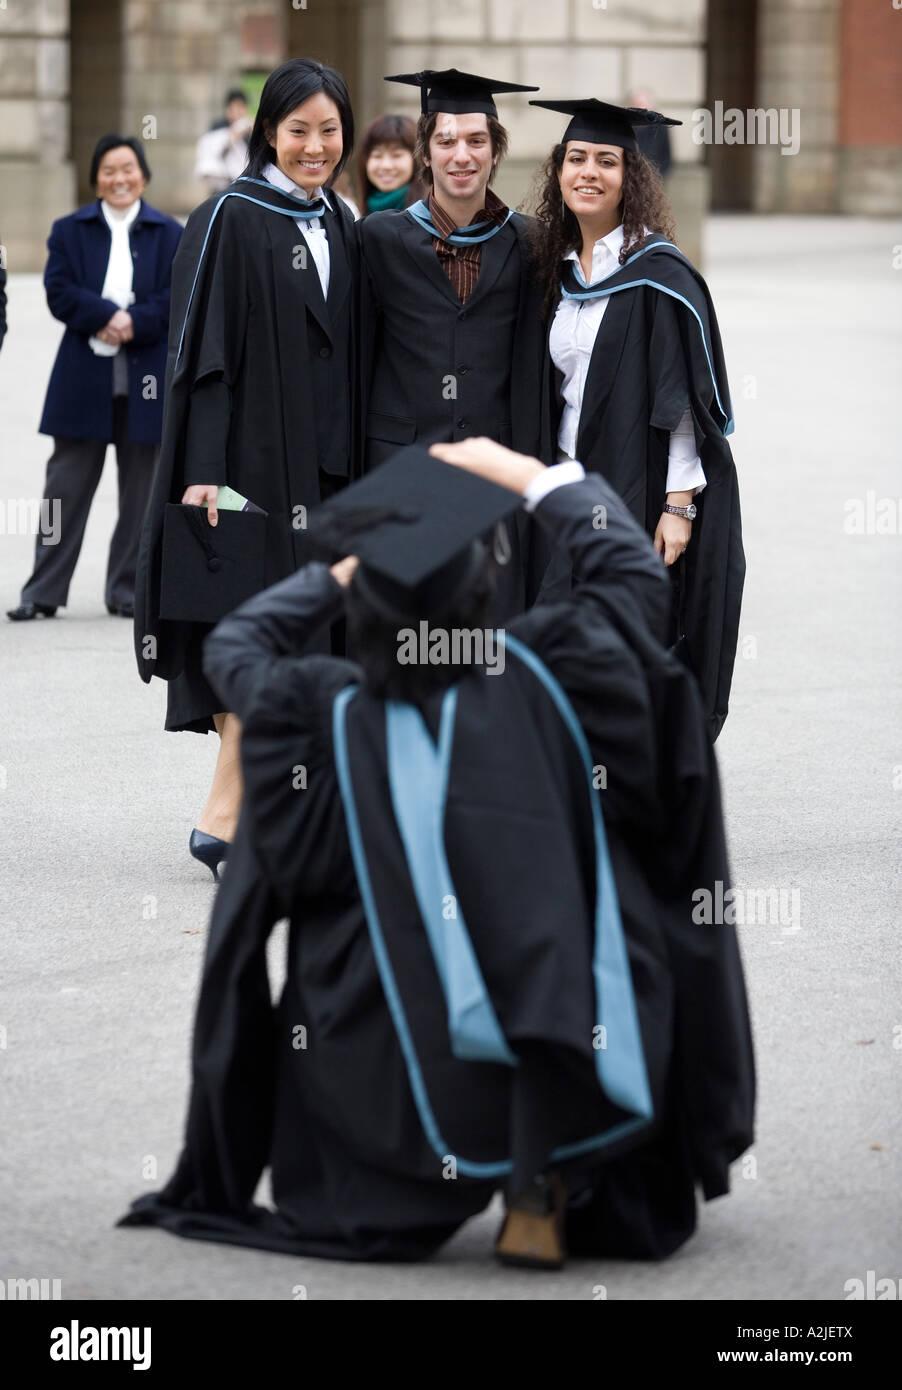 Graduation Ceremony University Birmingham Student Stock Photos ...